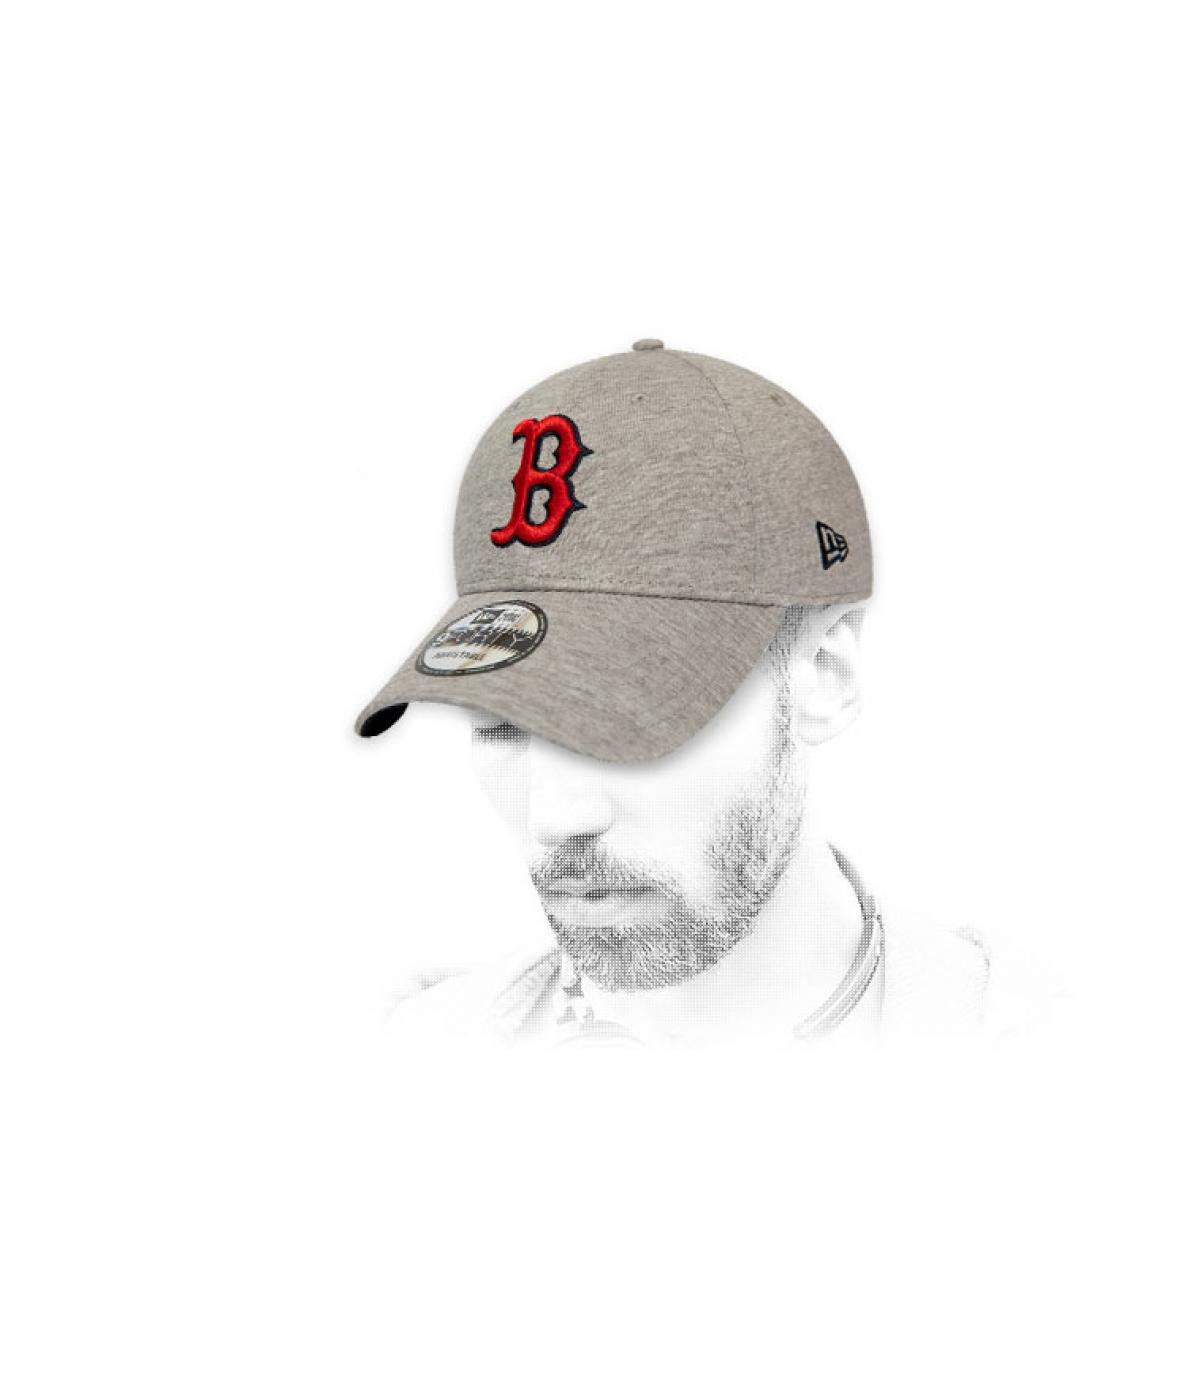 gorra B gris rojo